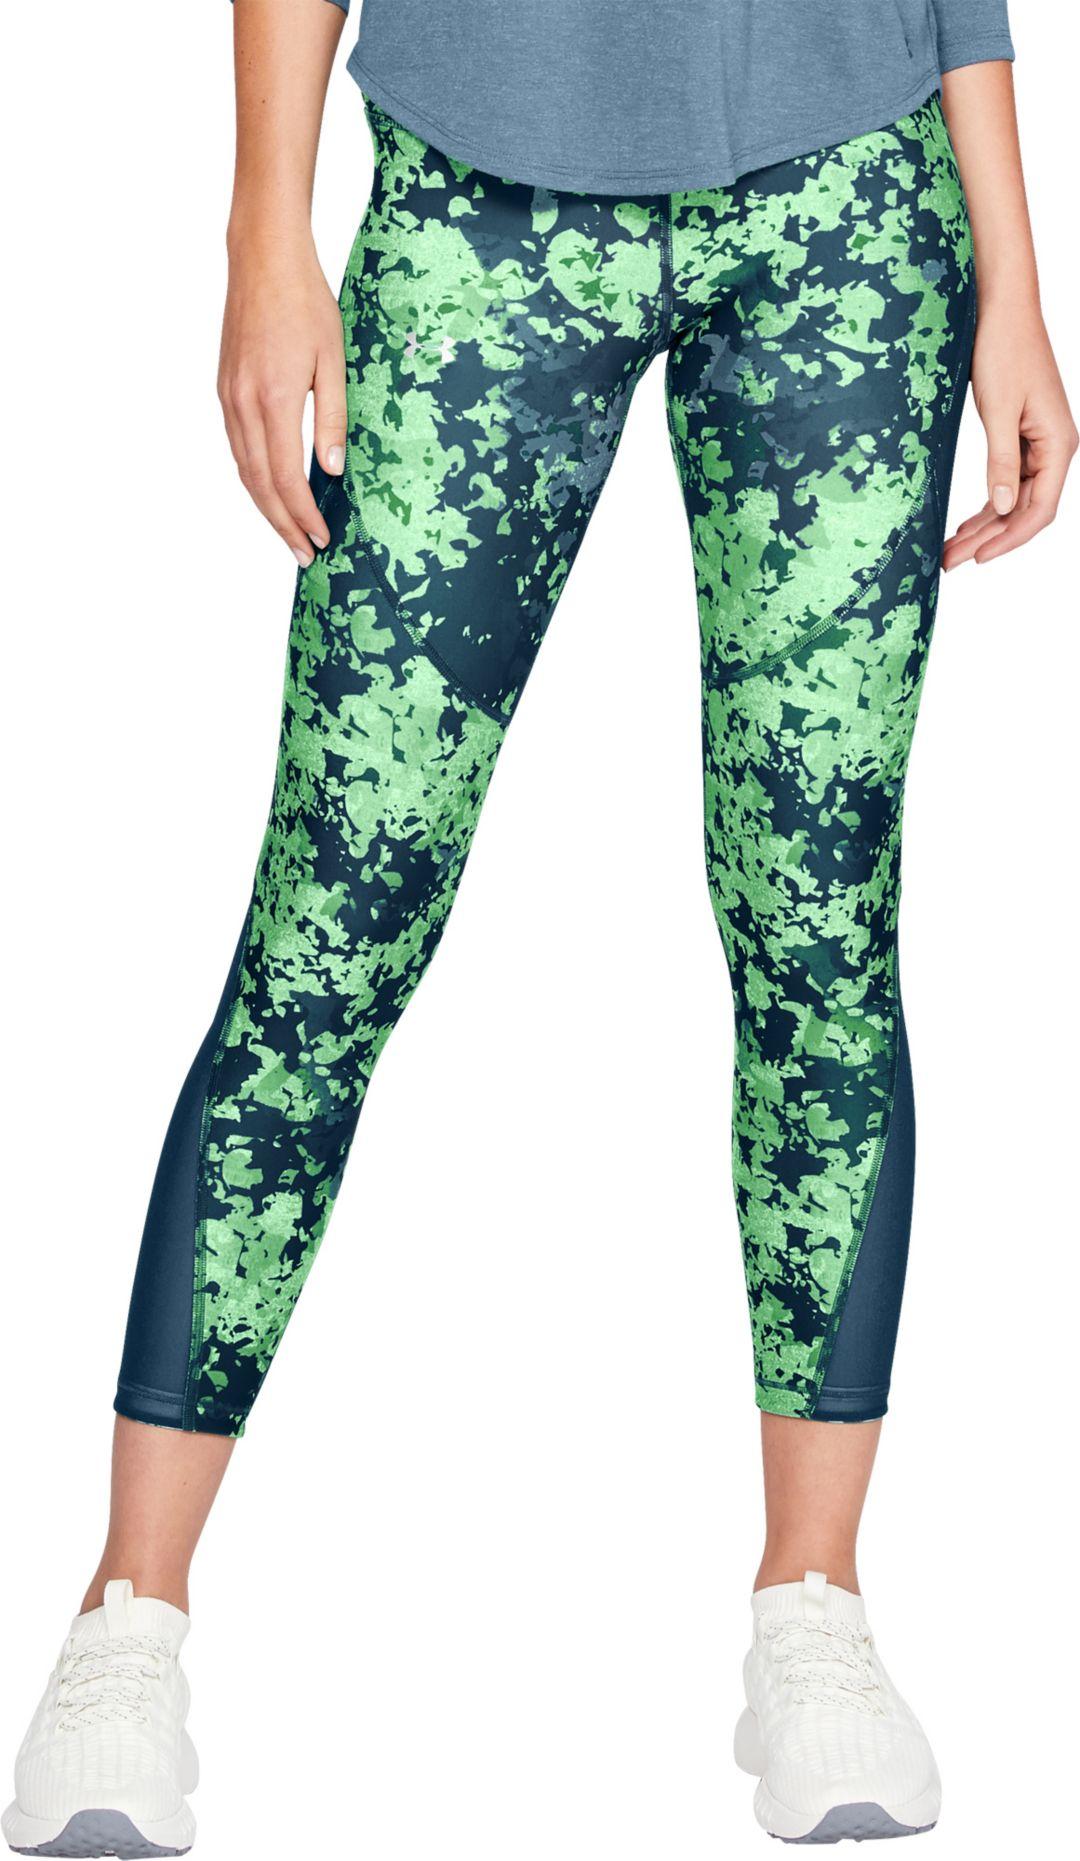 b624eea09d Under Armour Women's HeatGear Armour Print Ankle Crop 7/8 Leggings